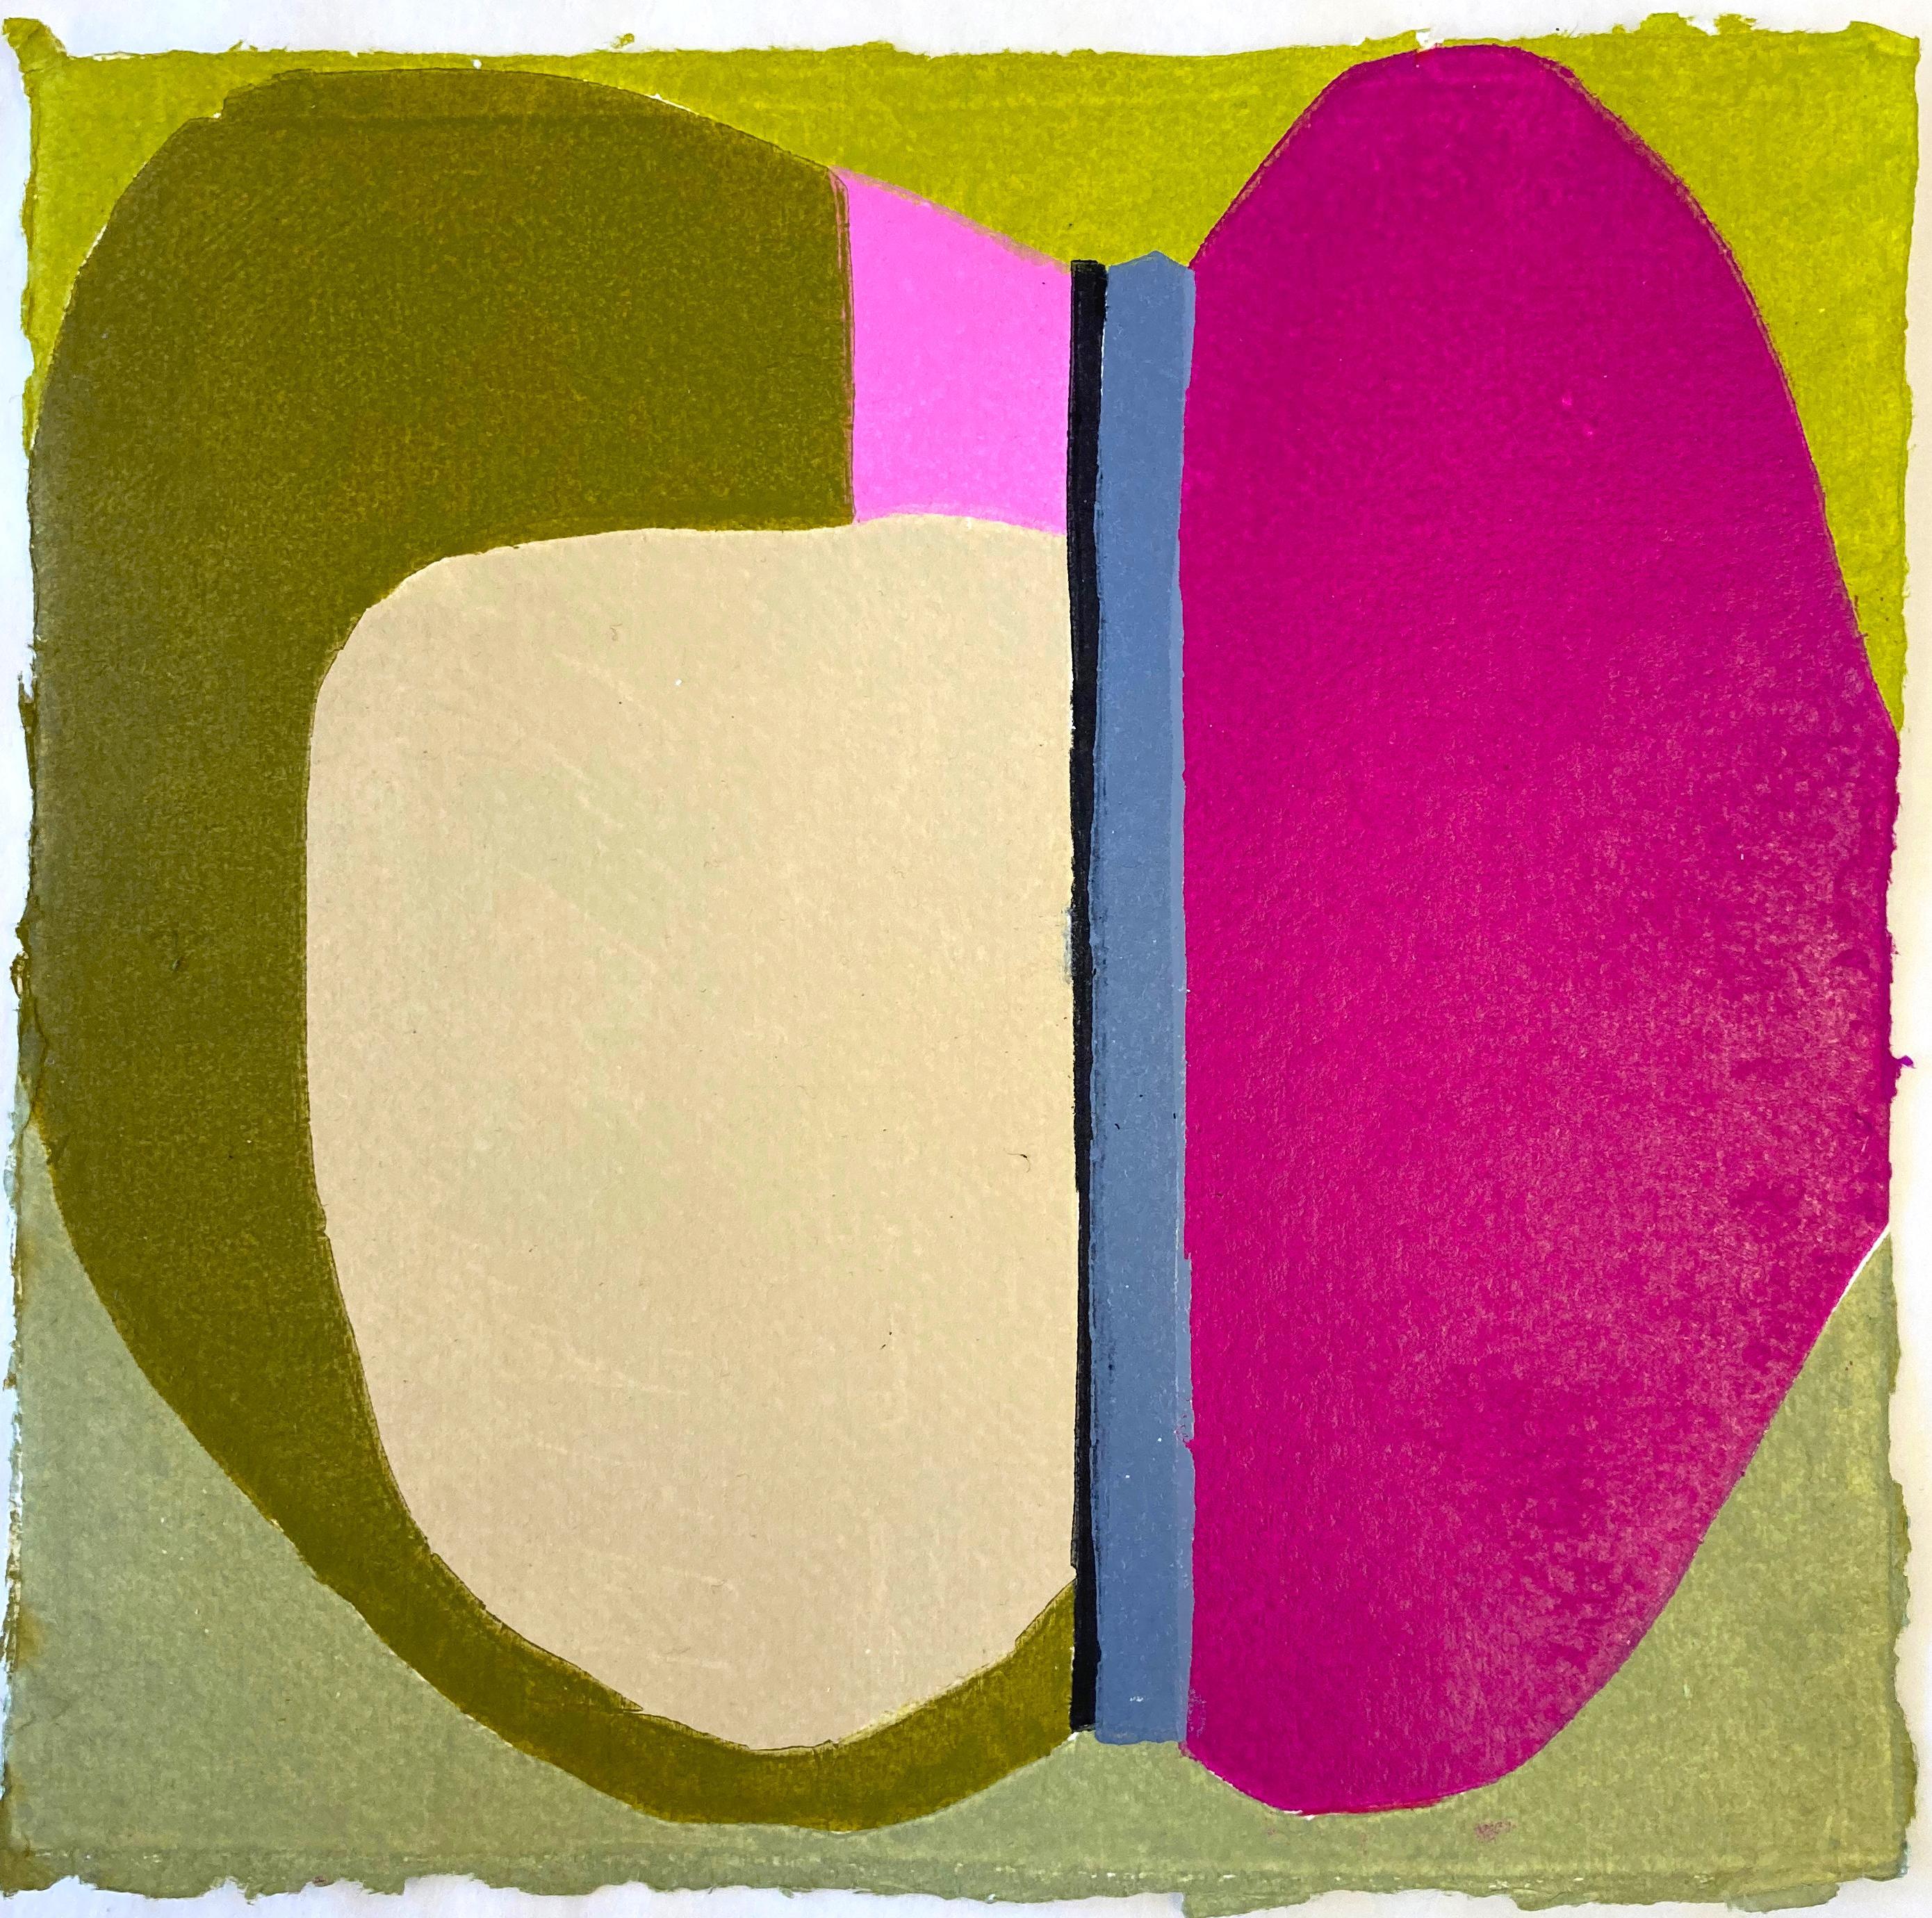 Venus by Jill Moser